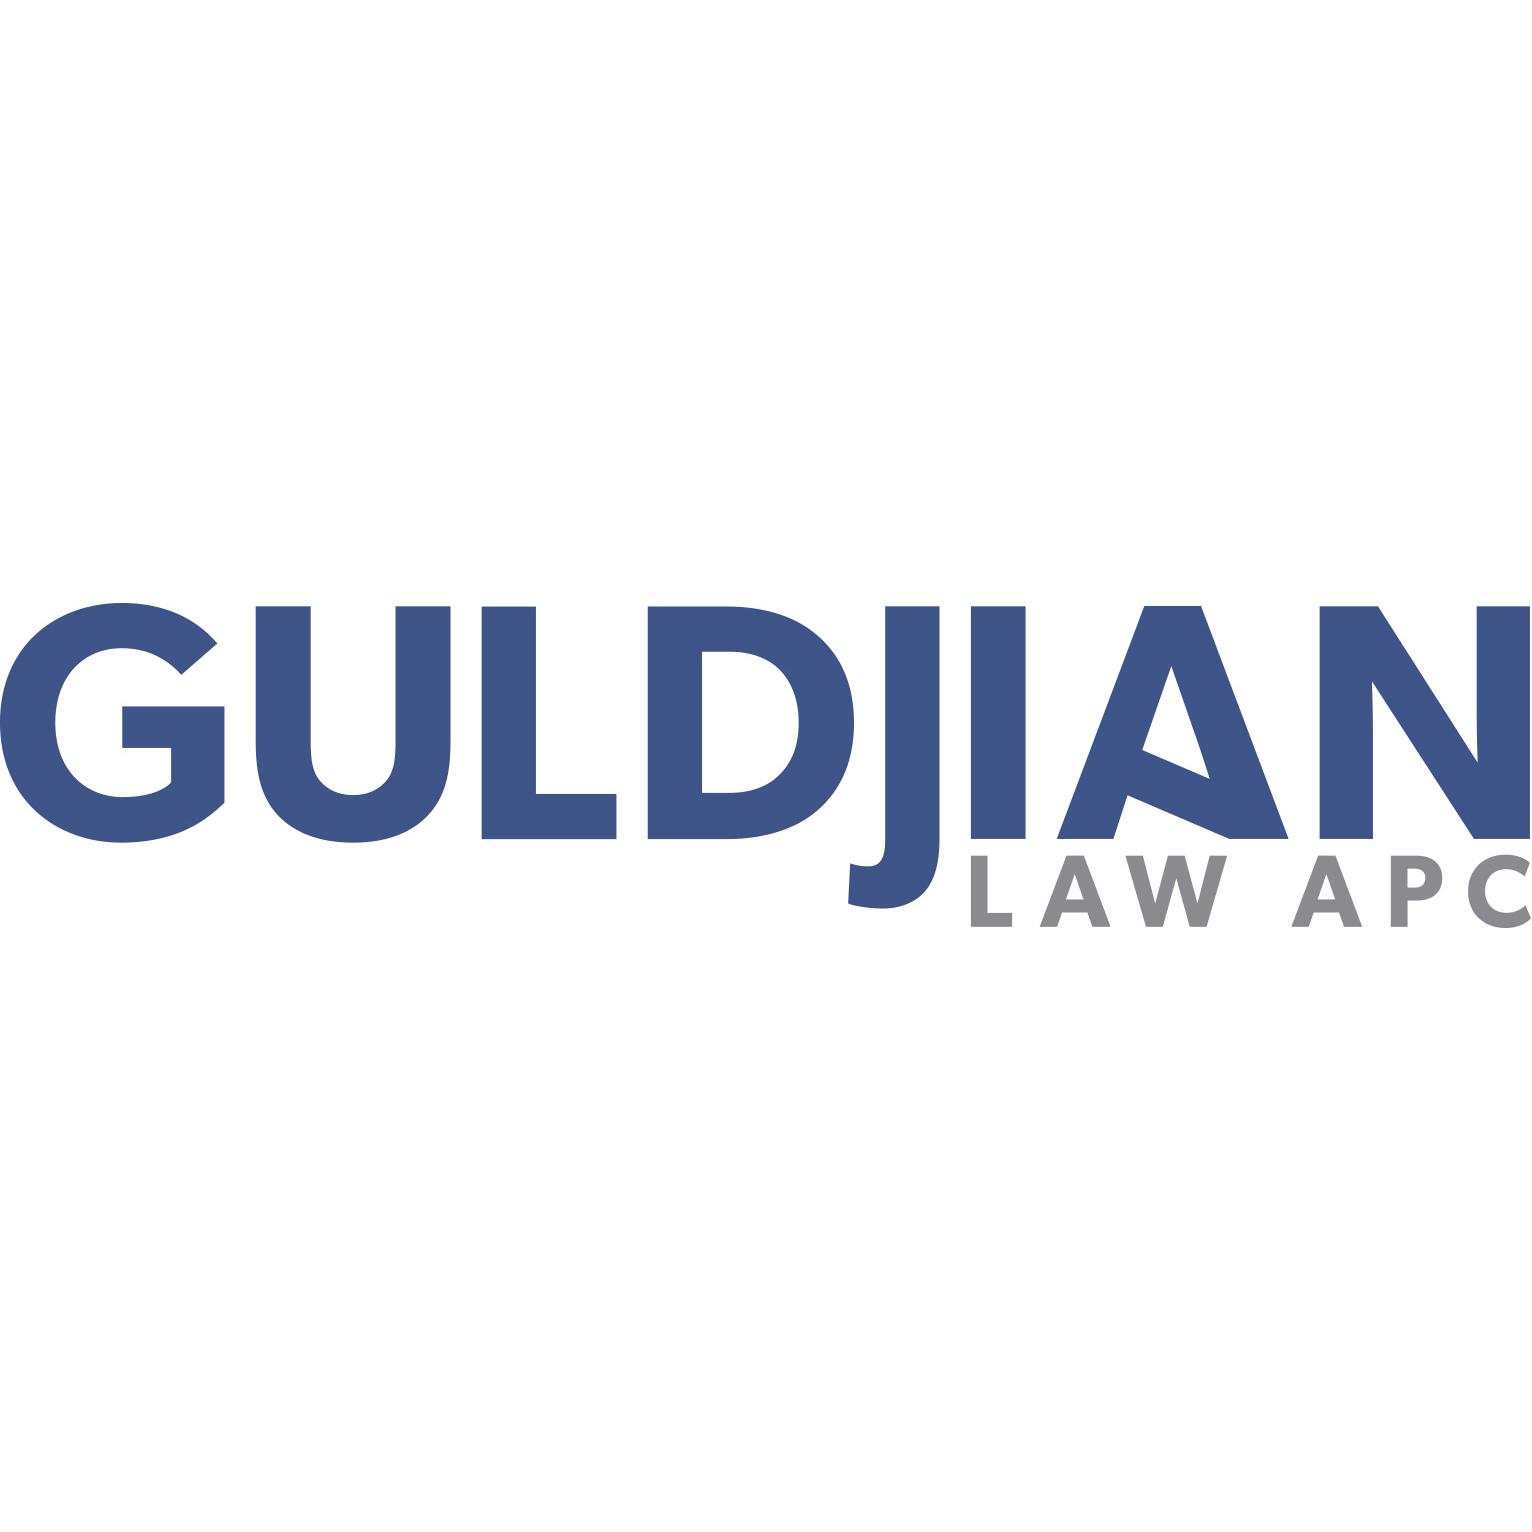 Guldjian Law APC image 0